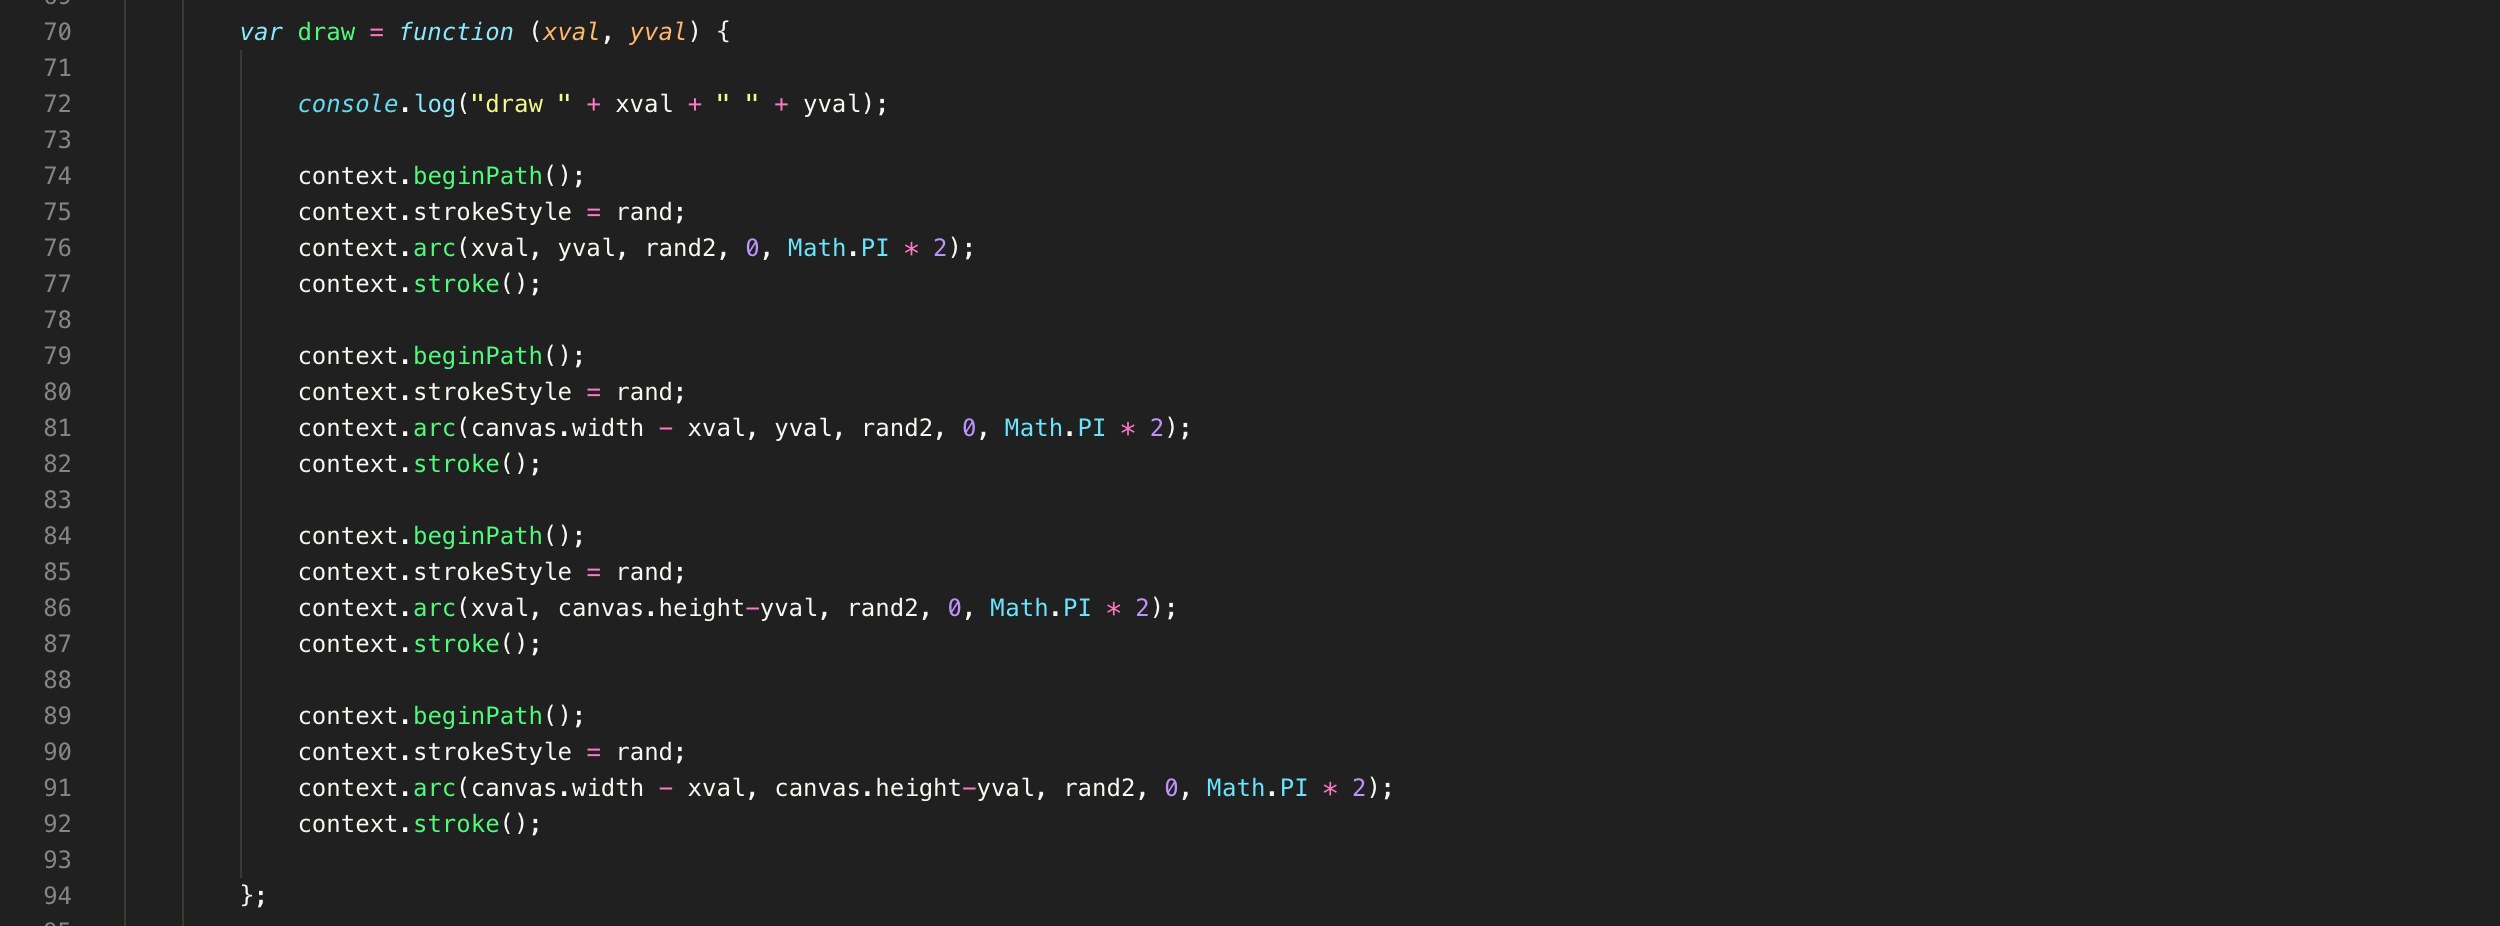 Code for Quadrants